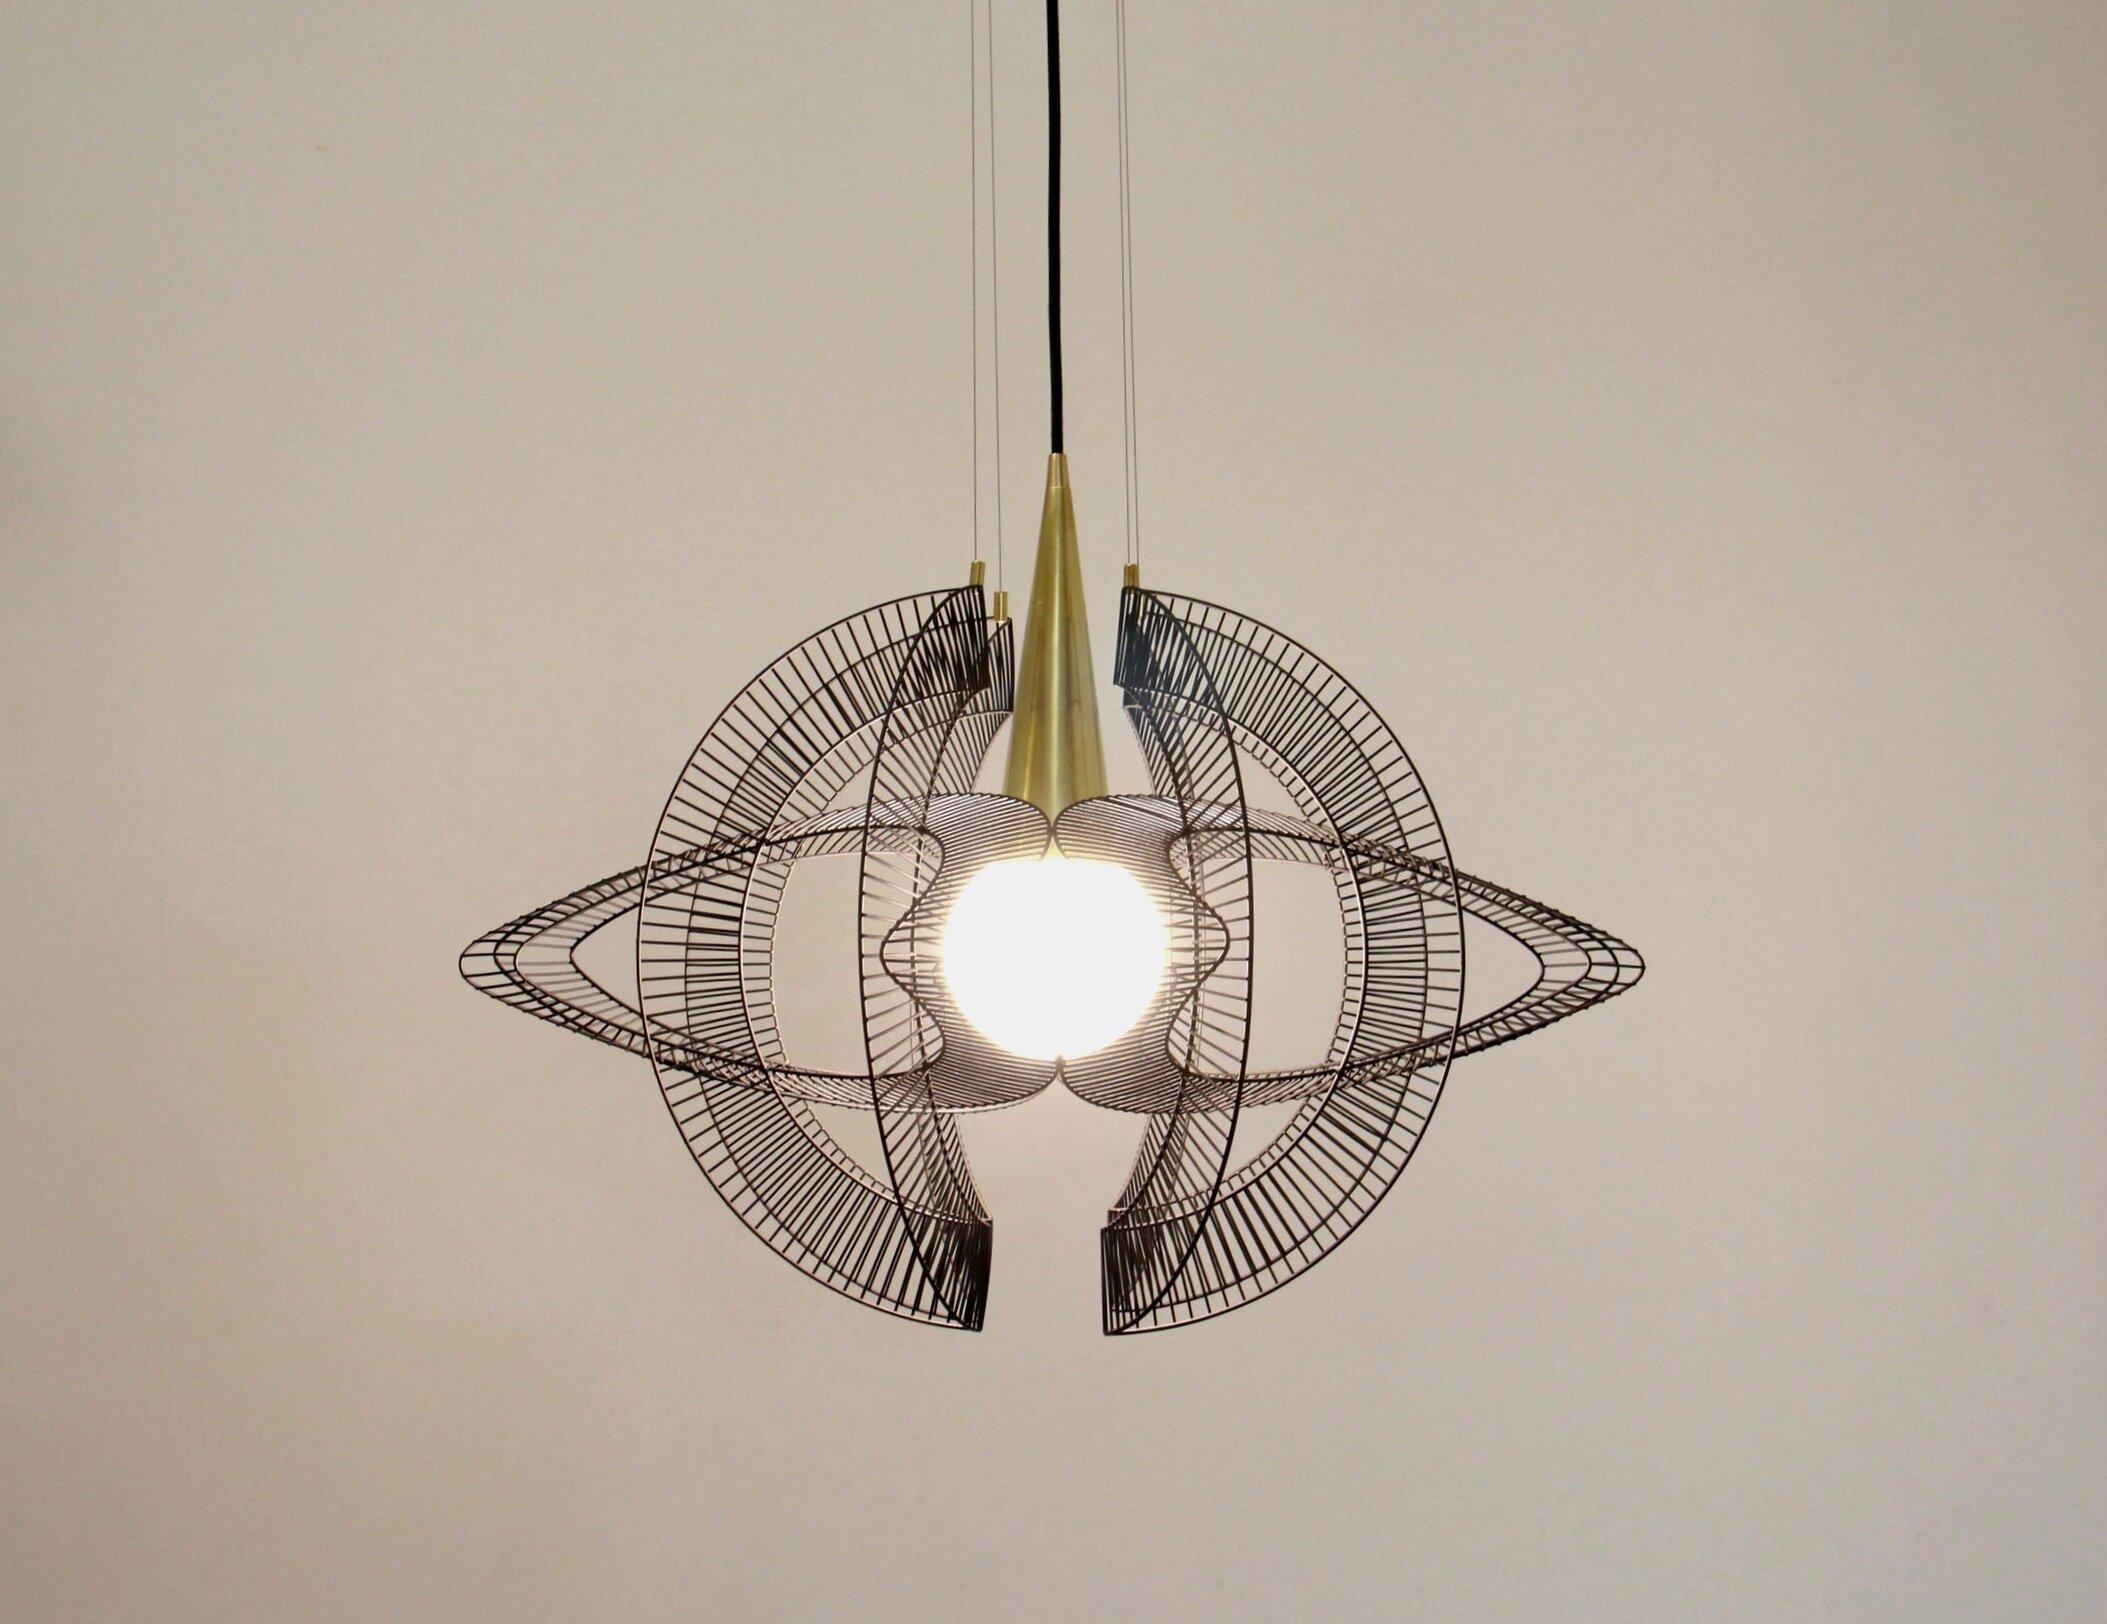 Olas_Sphera_black_brass_luminaire_design_lampe_lamp_studio-botte.jpg